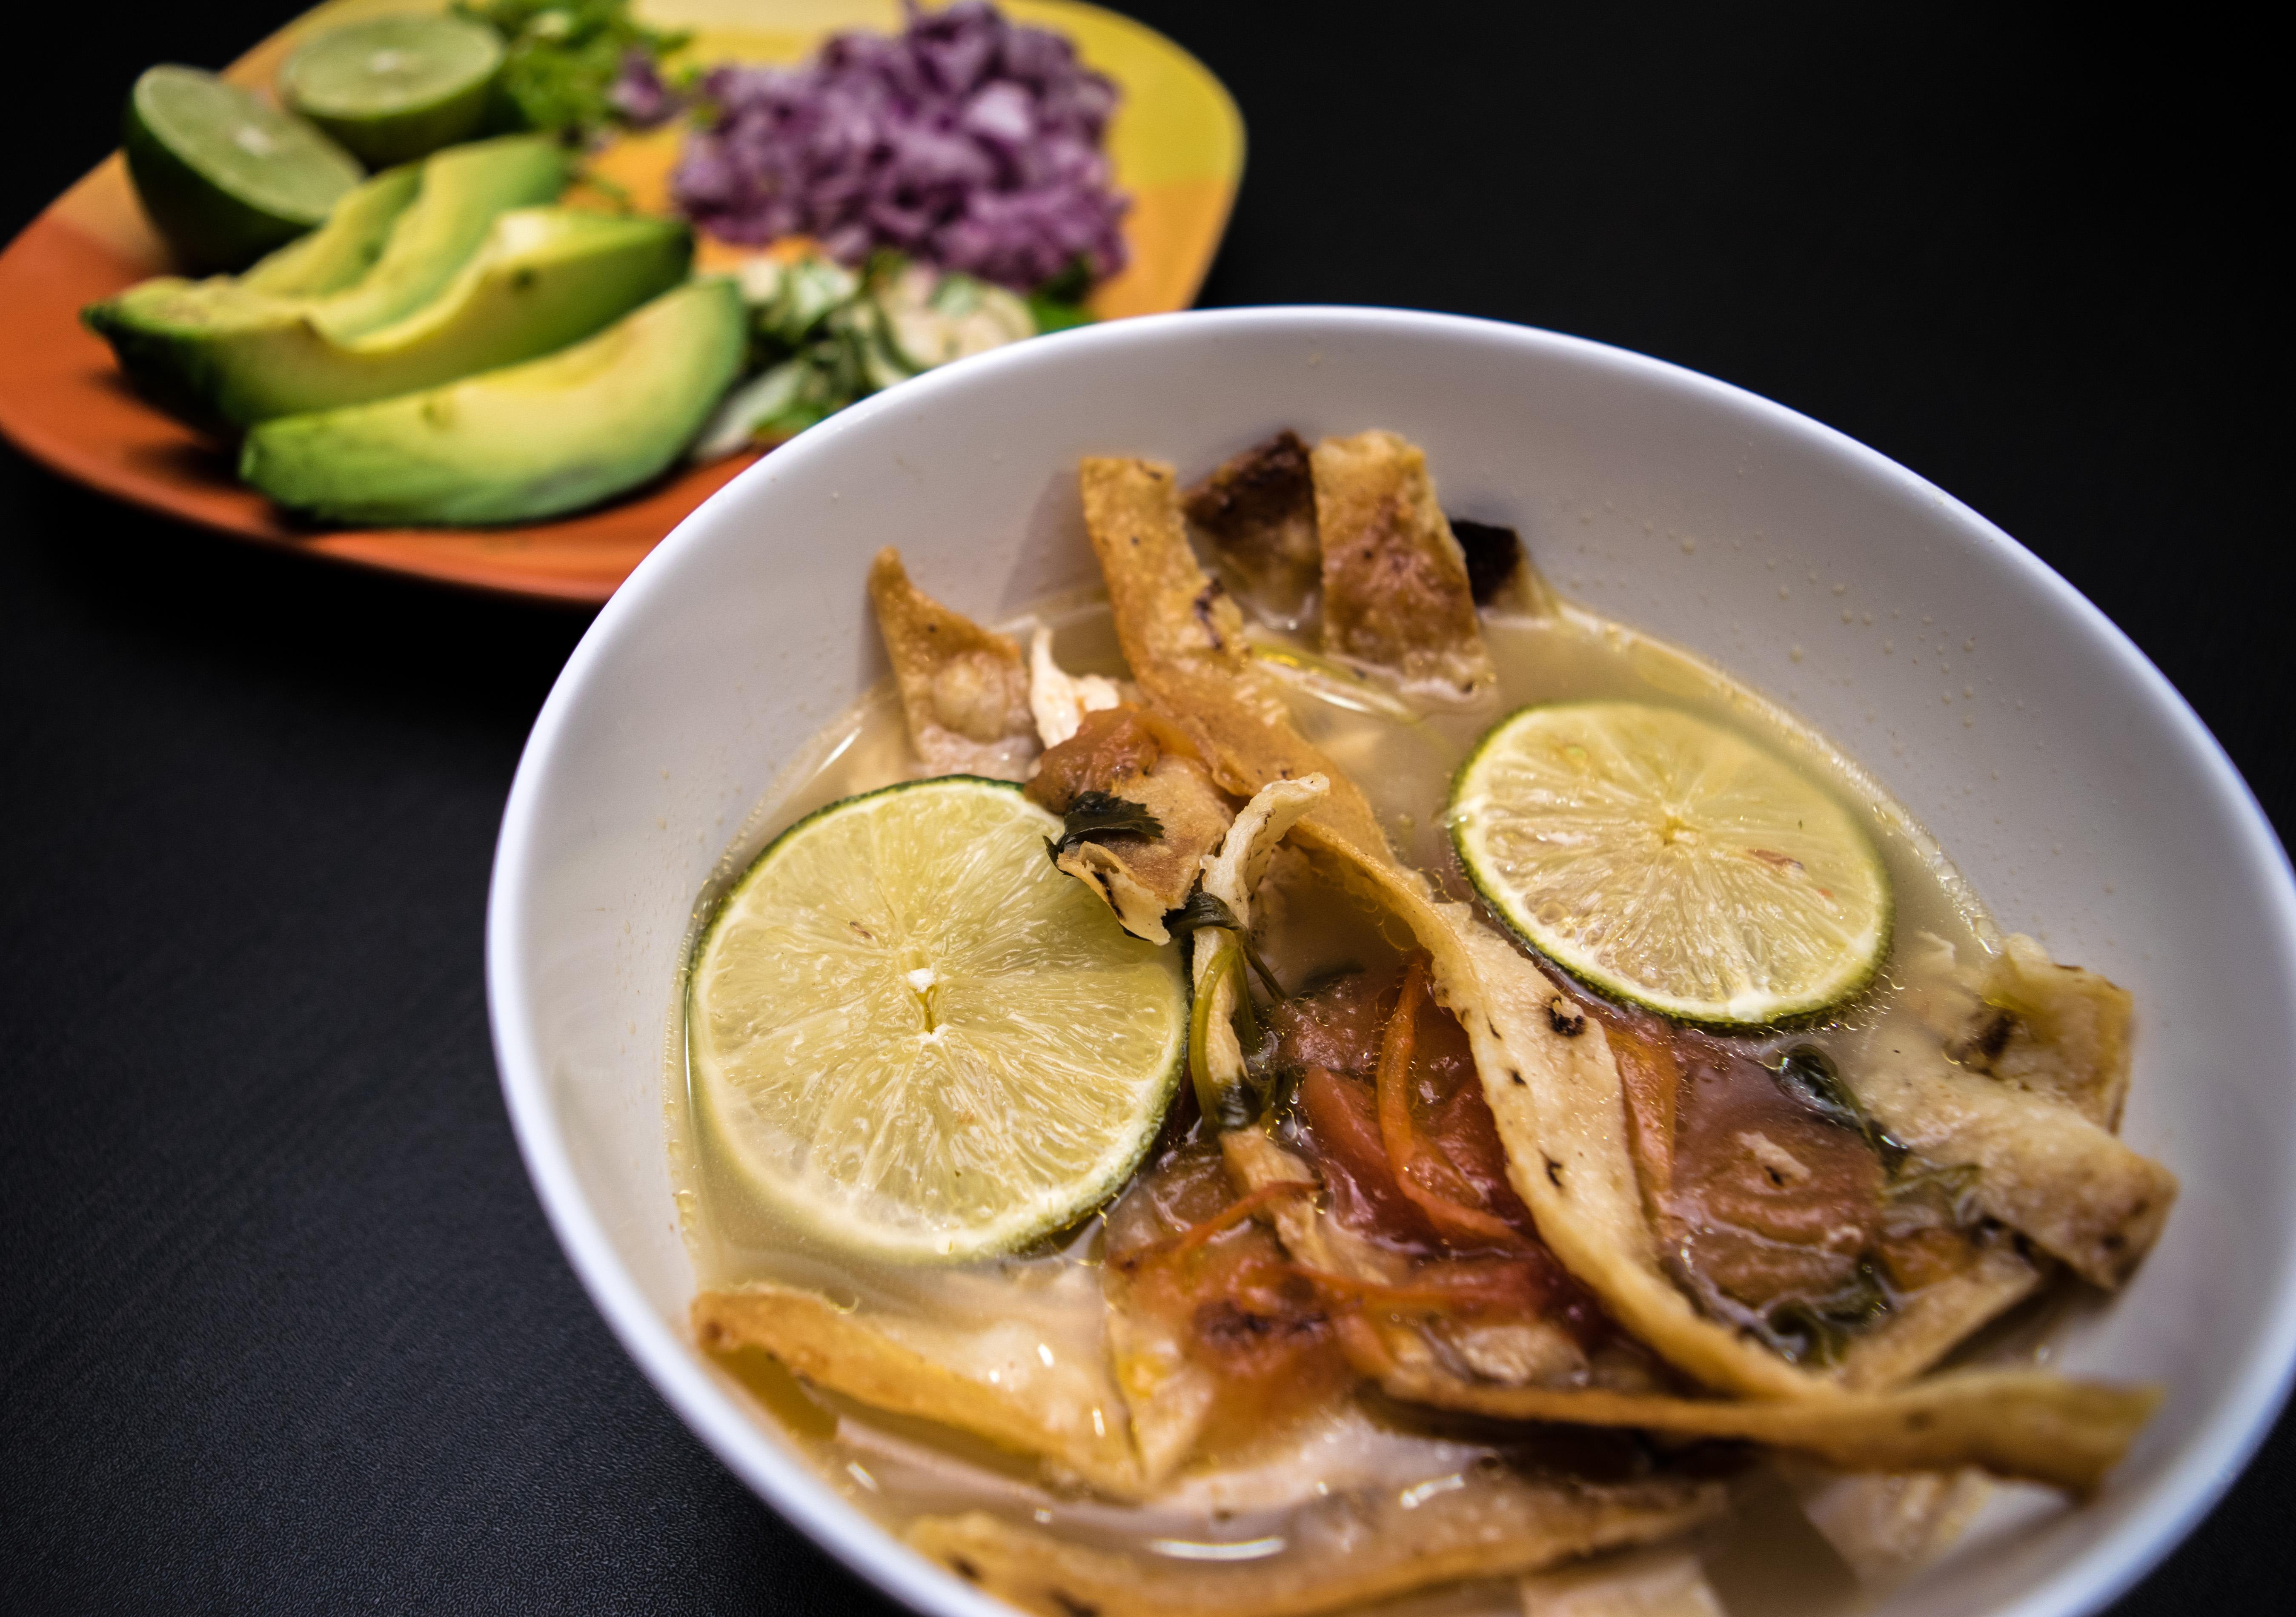 sopa de lima, Yucatán cuisine